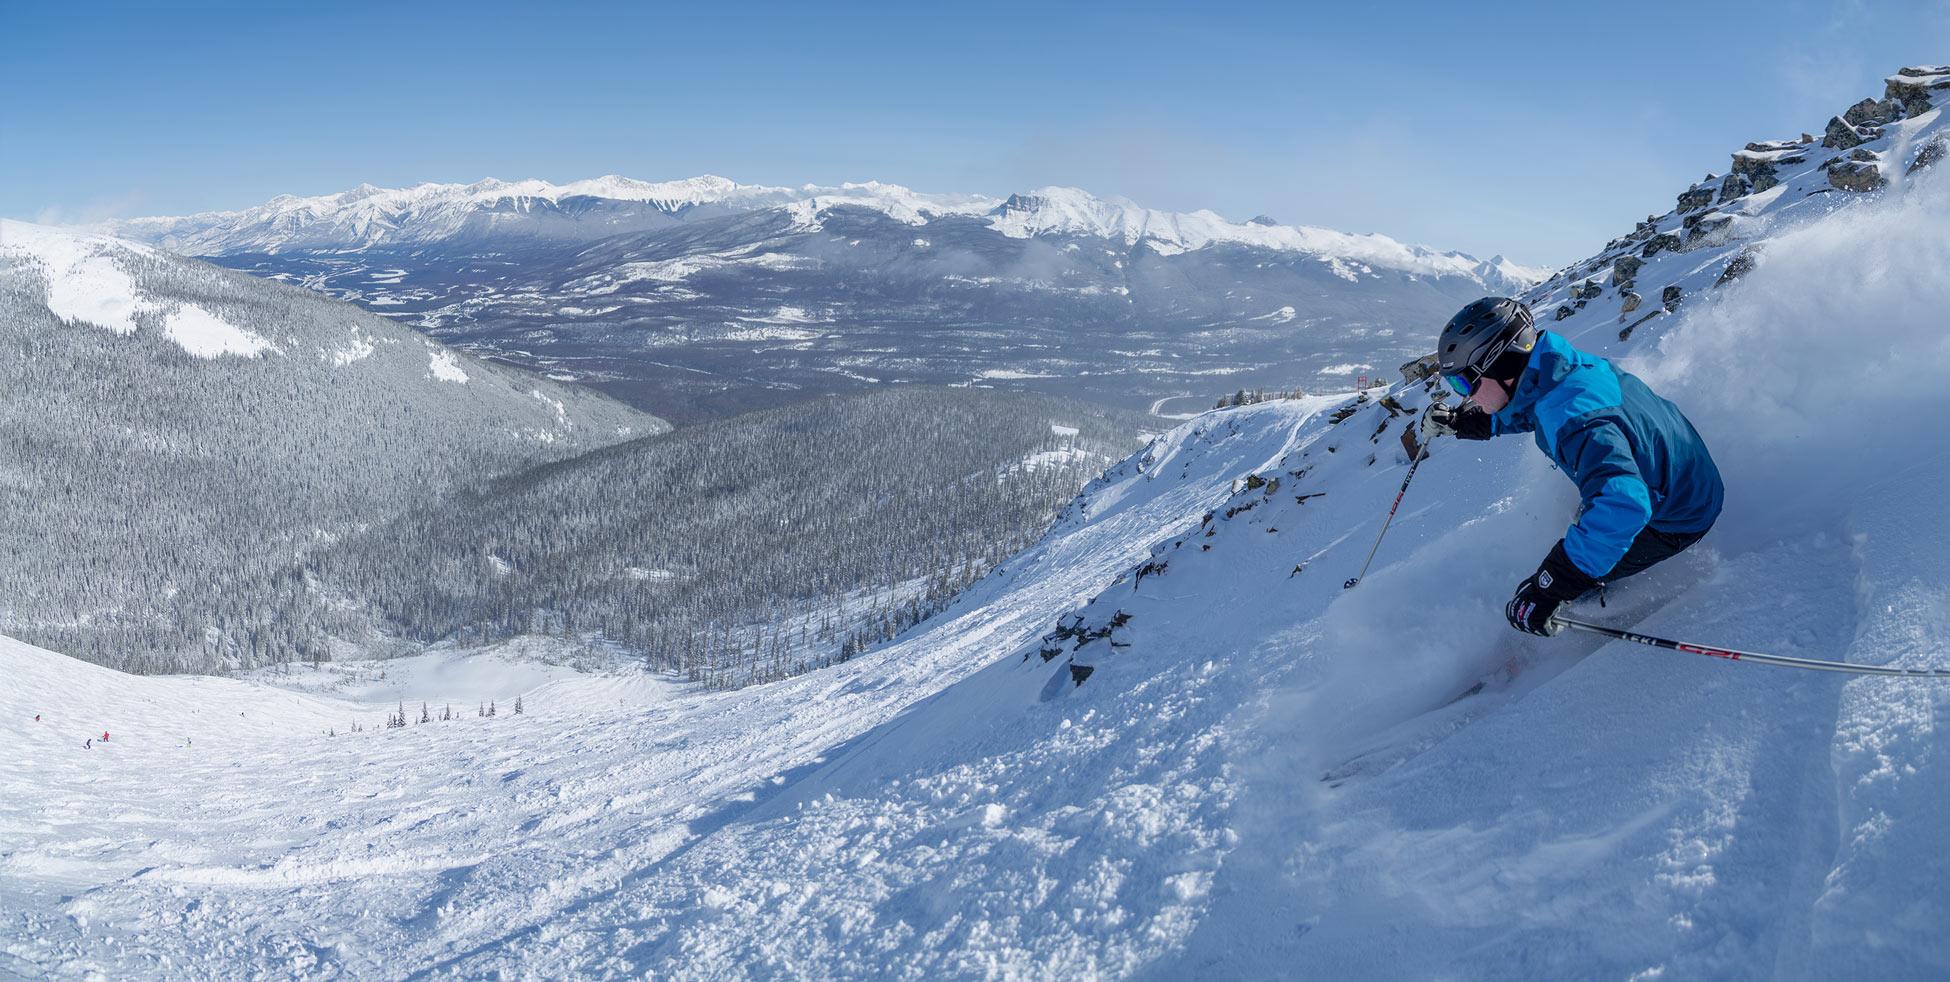 Weite Powder-Bowls in Marmot Basin. Foto: Ryan Bray